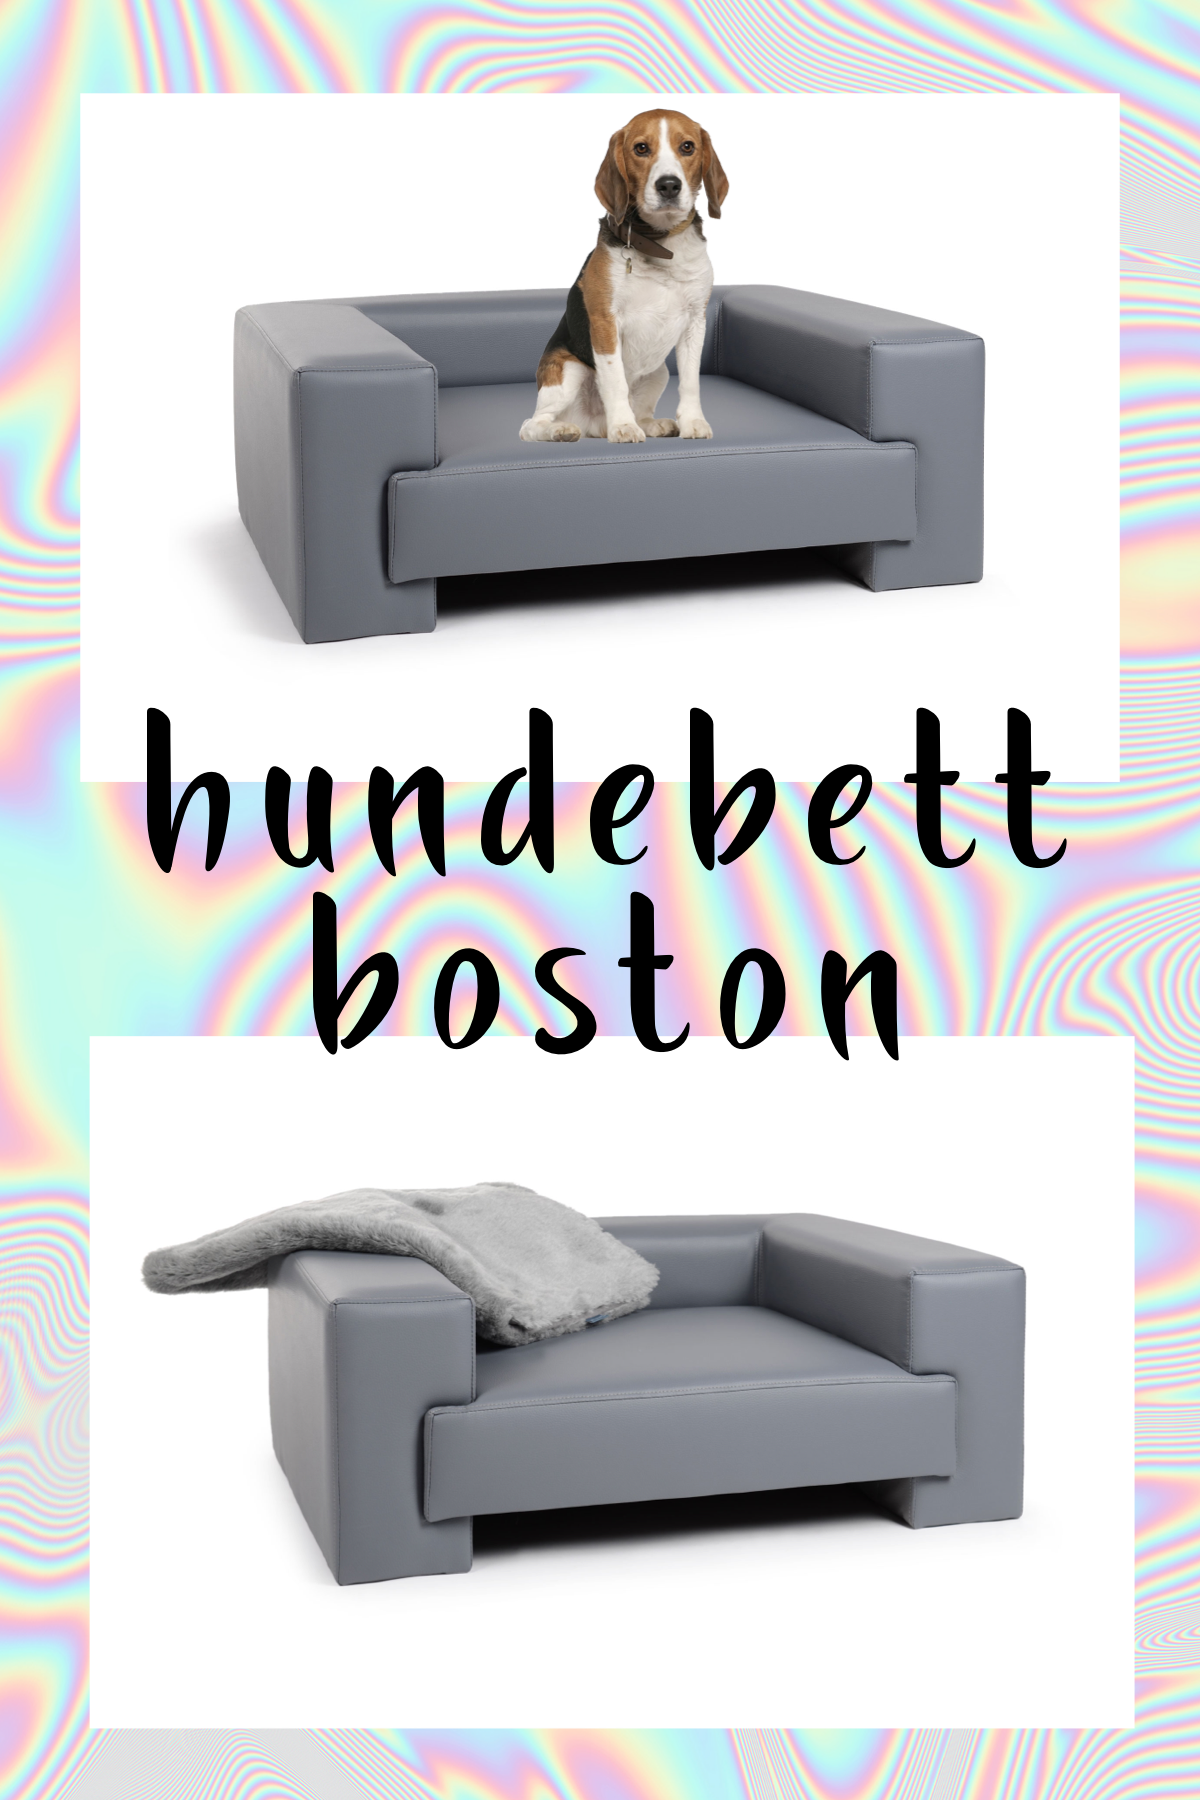 Hundesofa Boston Ein Platz Zum Entspannen Und Wohlfuhlen Hund Sofa Hundesofa Hunde